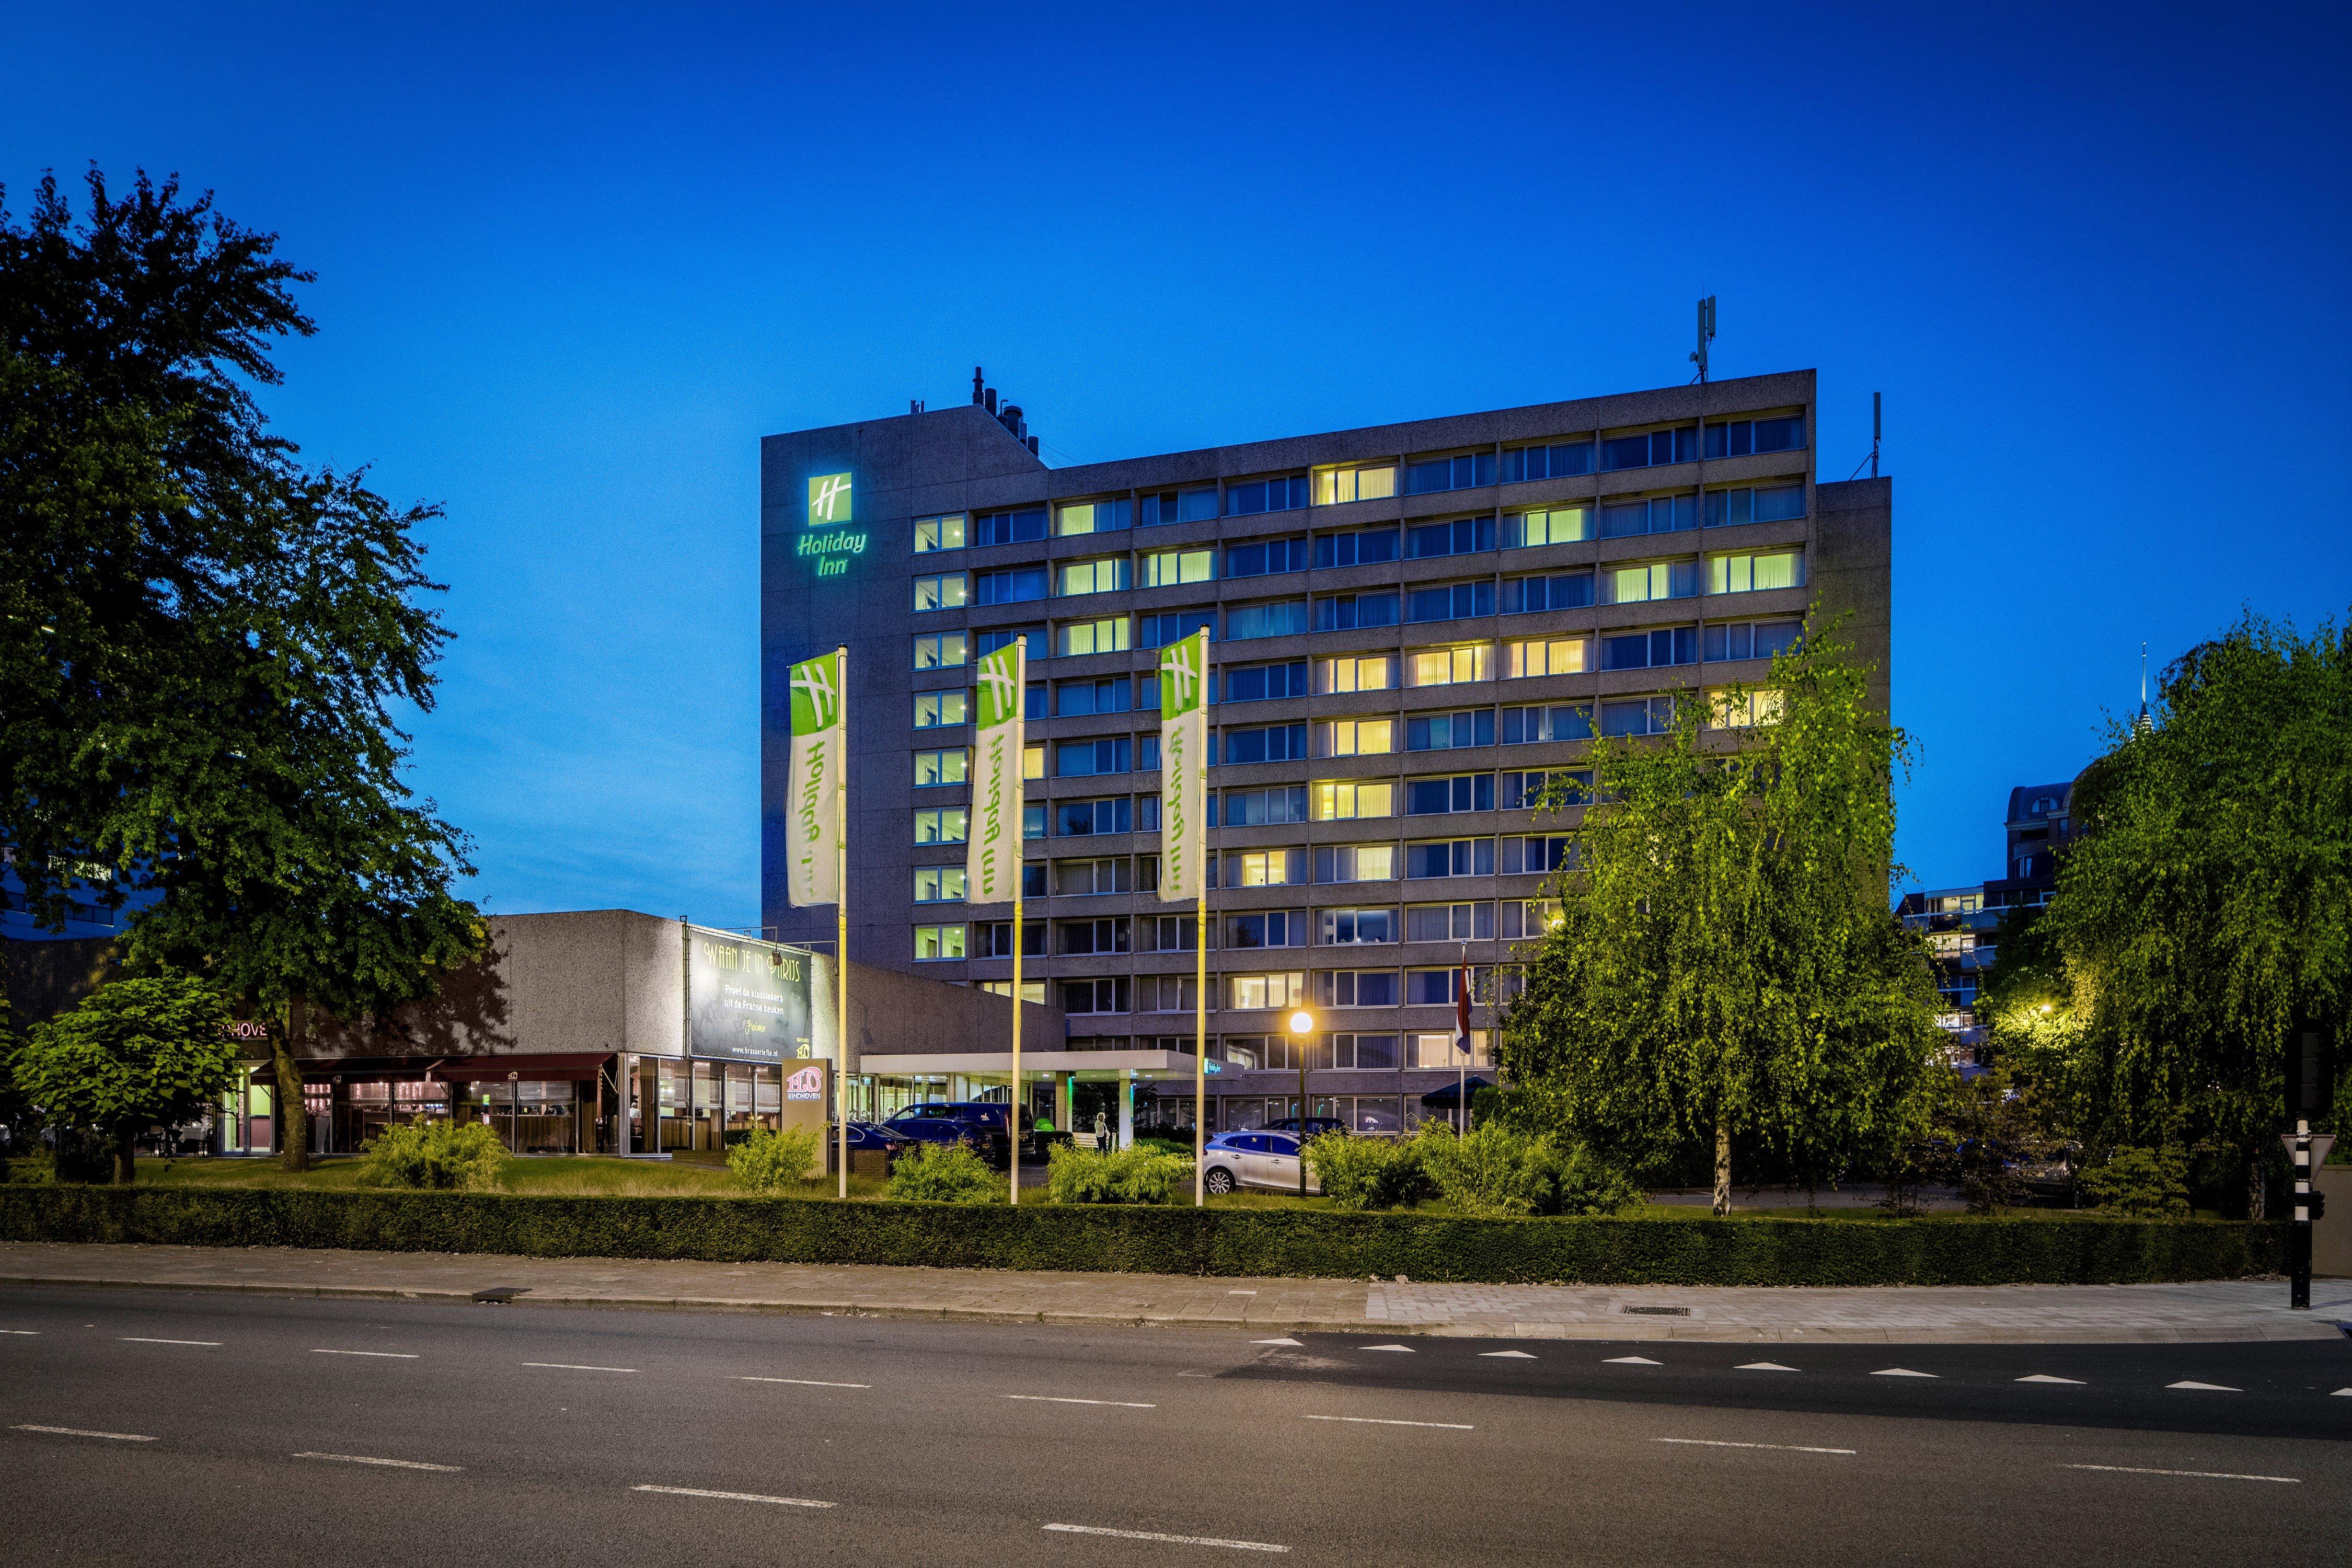 Holiday Inn Hotel Eindhoven